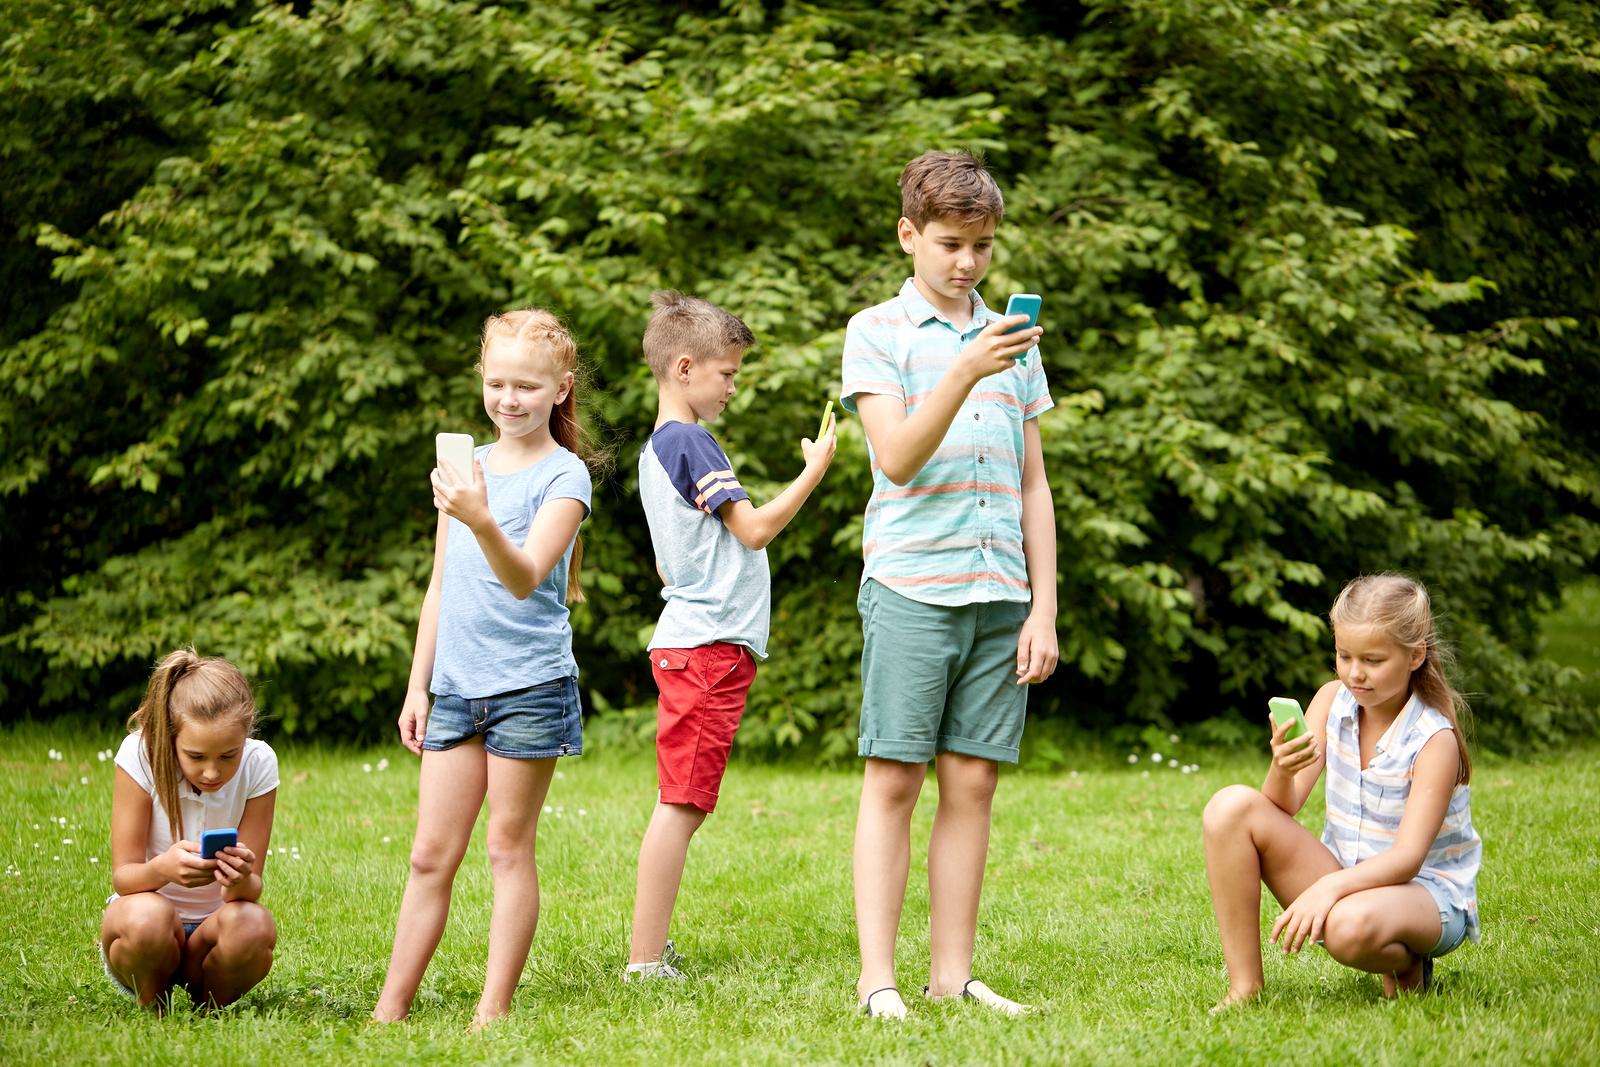 bigstock-childhood-augmented-reality--152820554.jpg